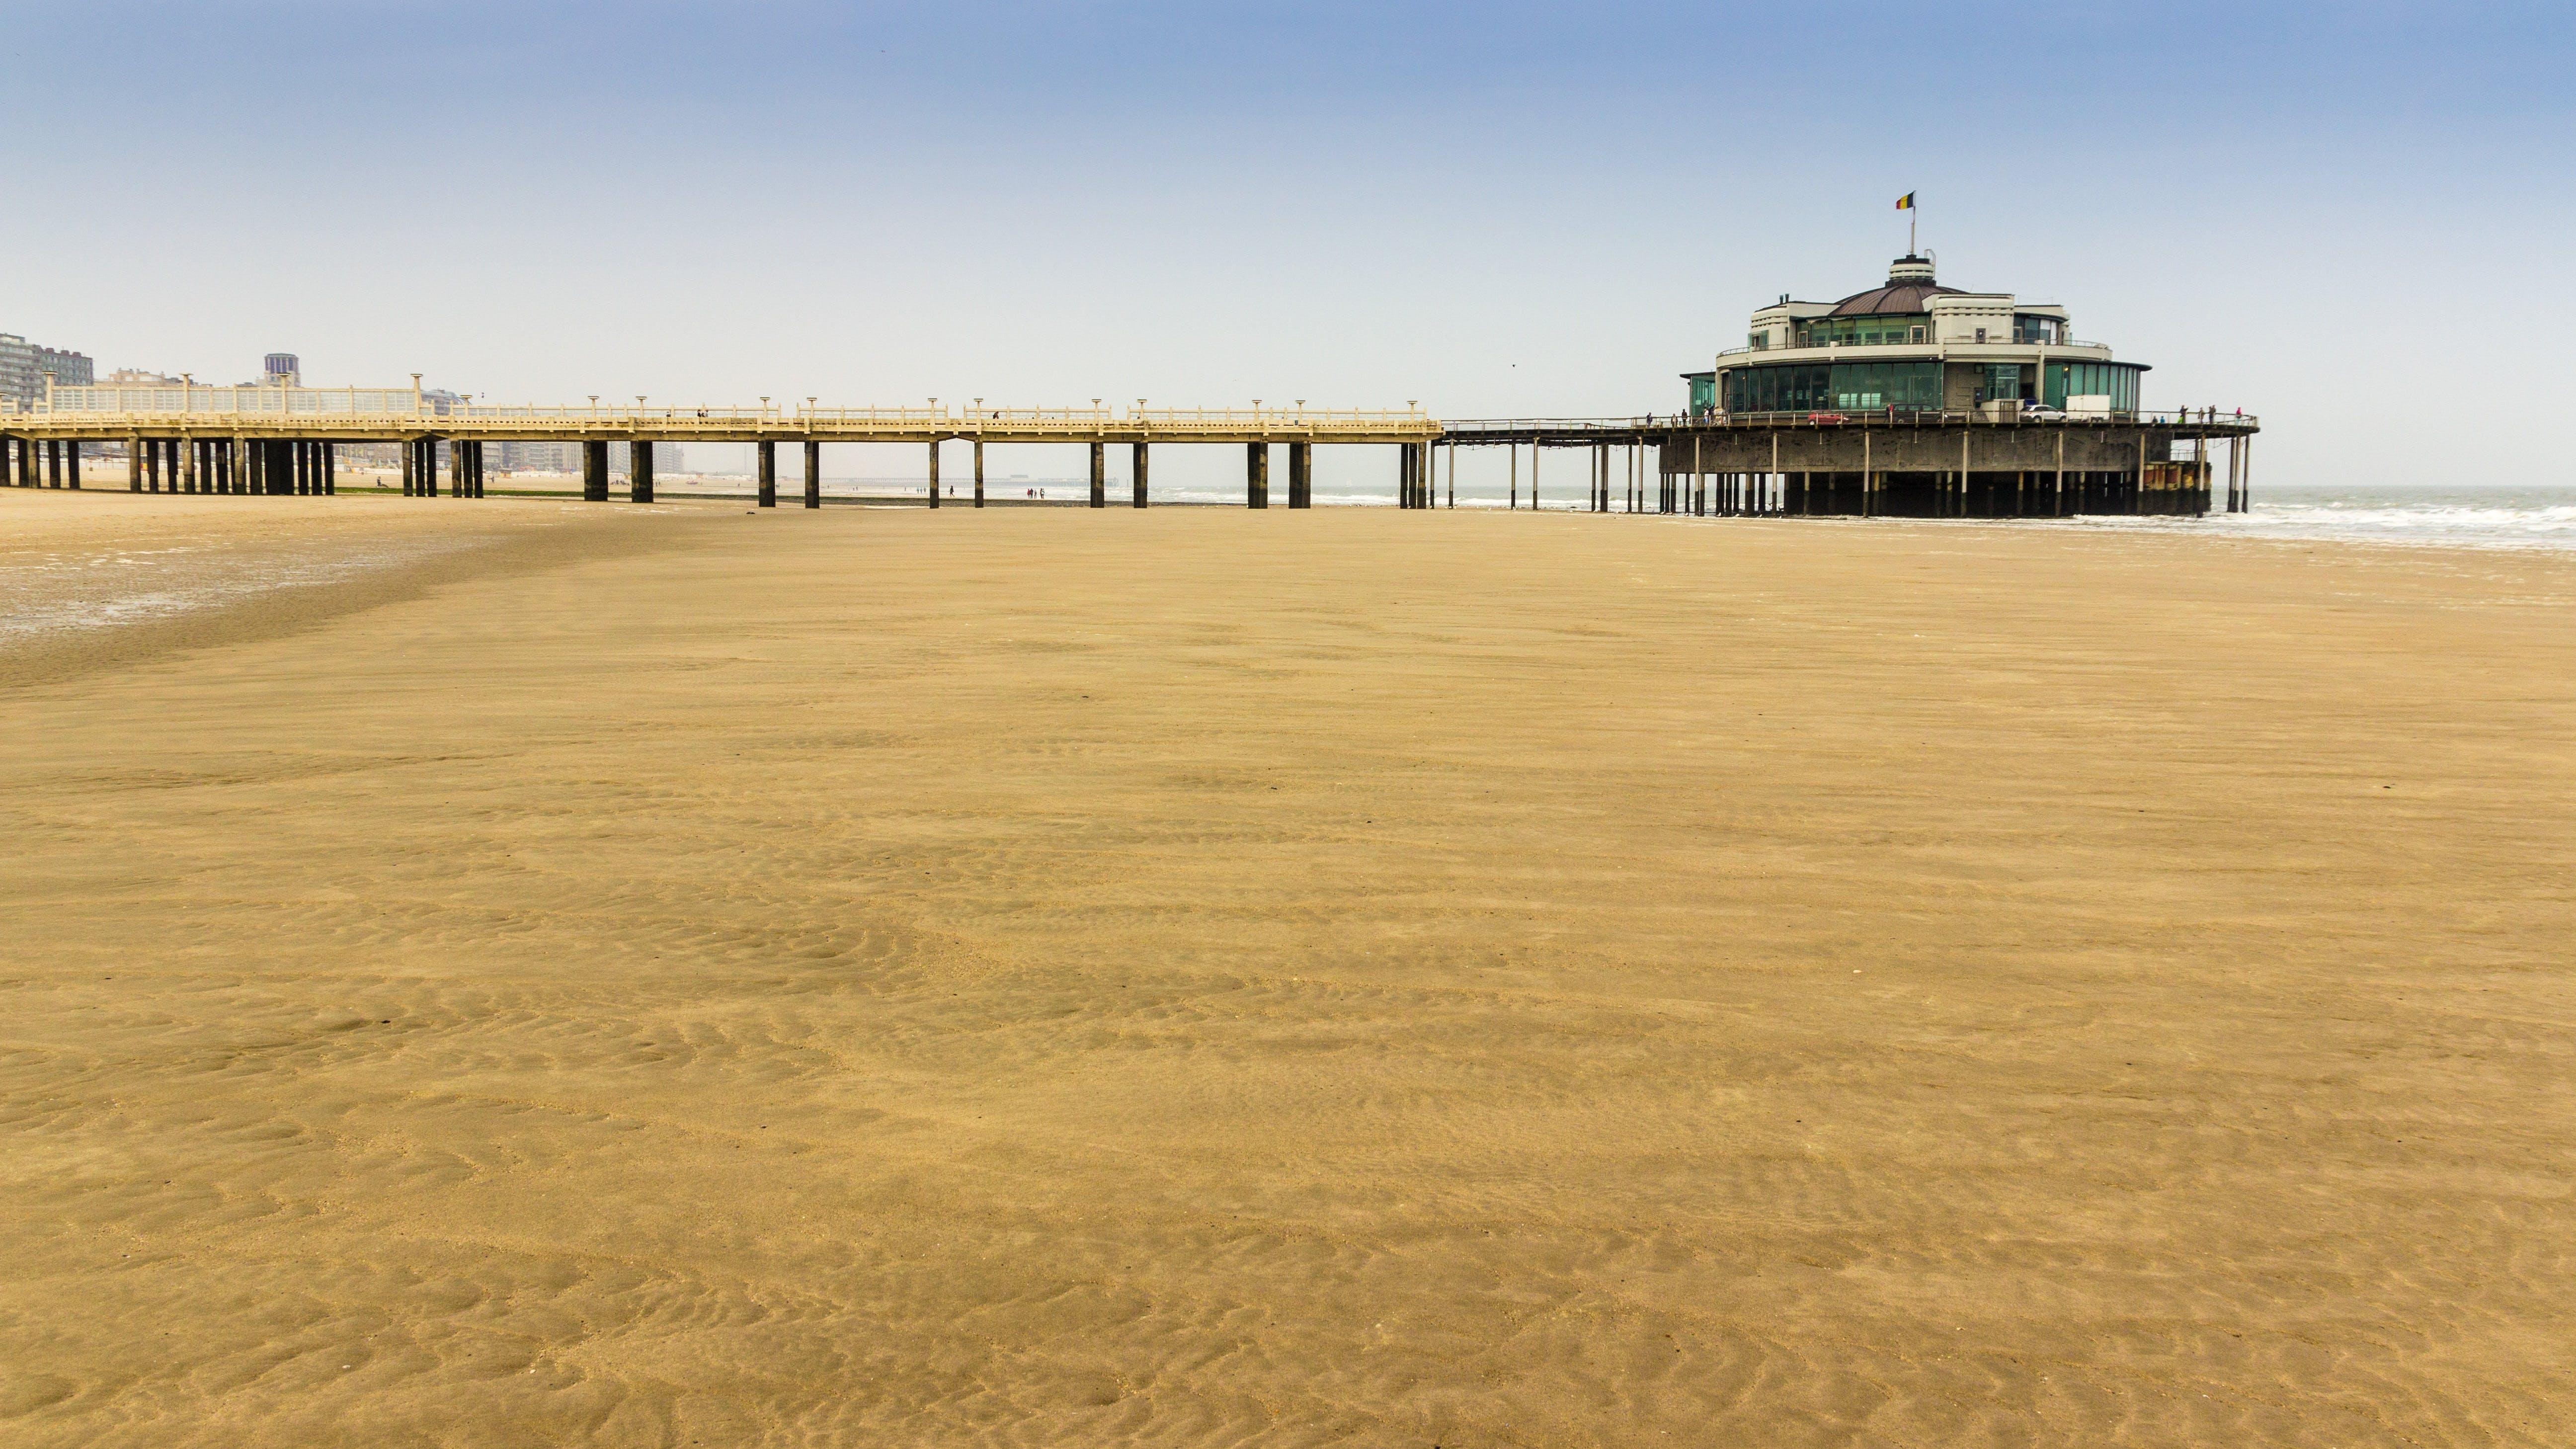 Free stock photo of beach, sand, North Sea, sea bridge